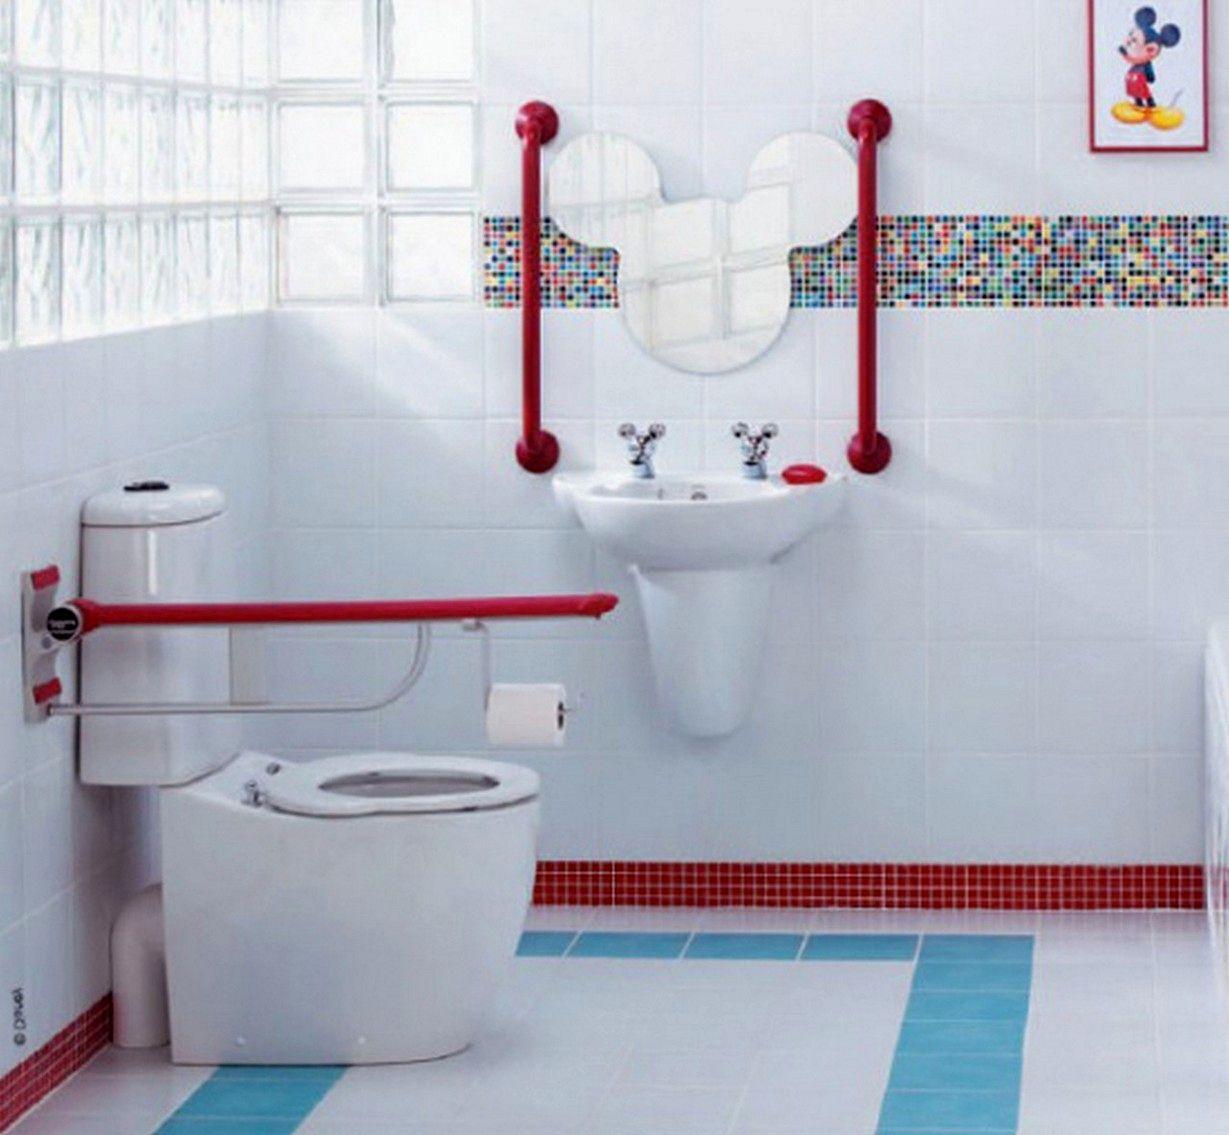 stylish star wars bathroom design-Luxury Star Wars Bathroom Picture